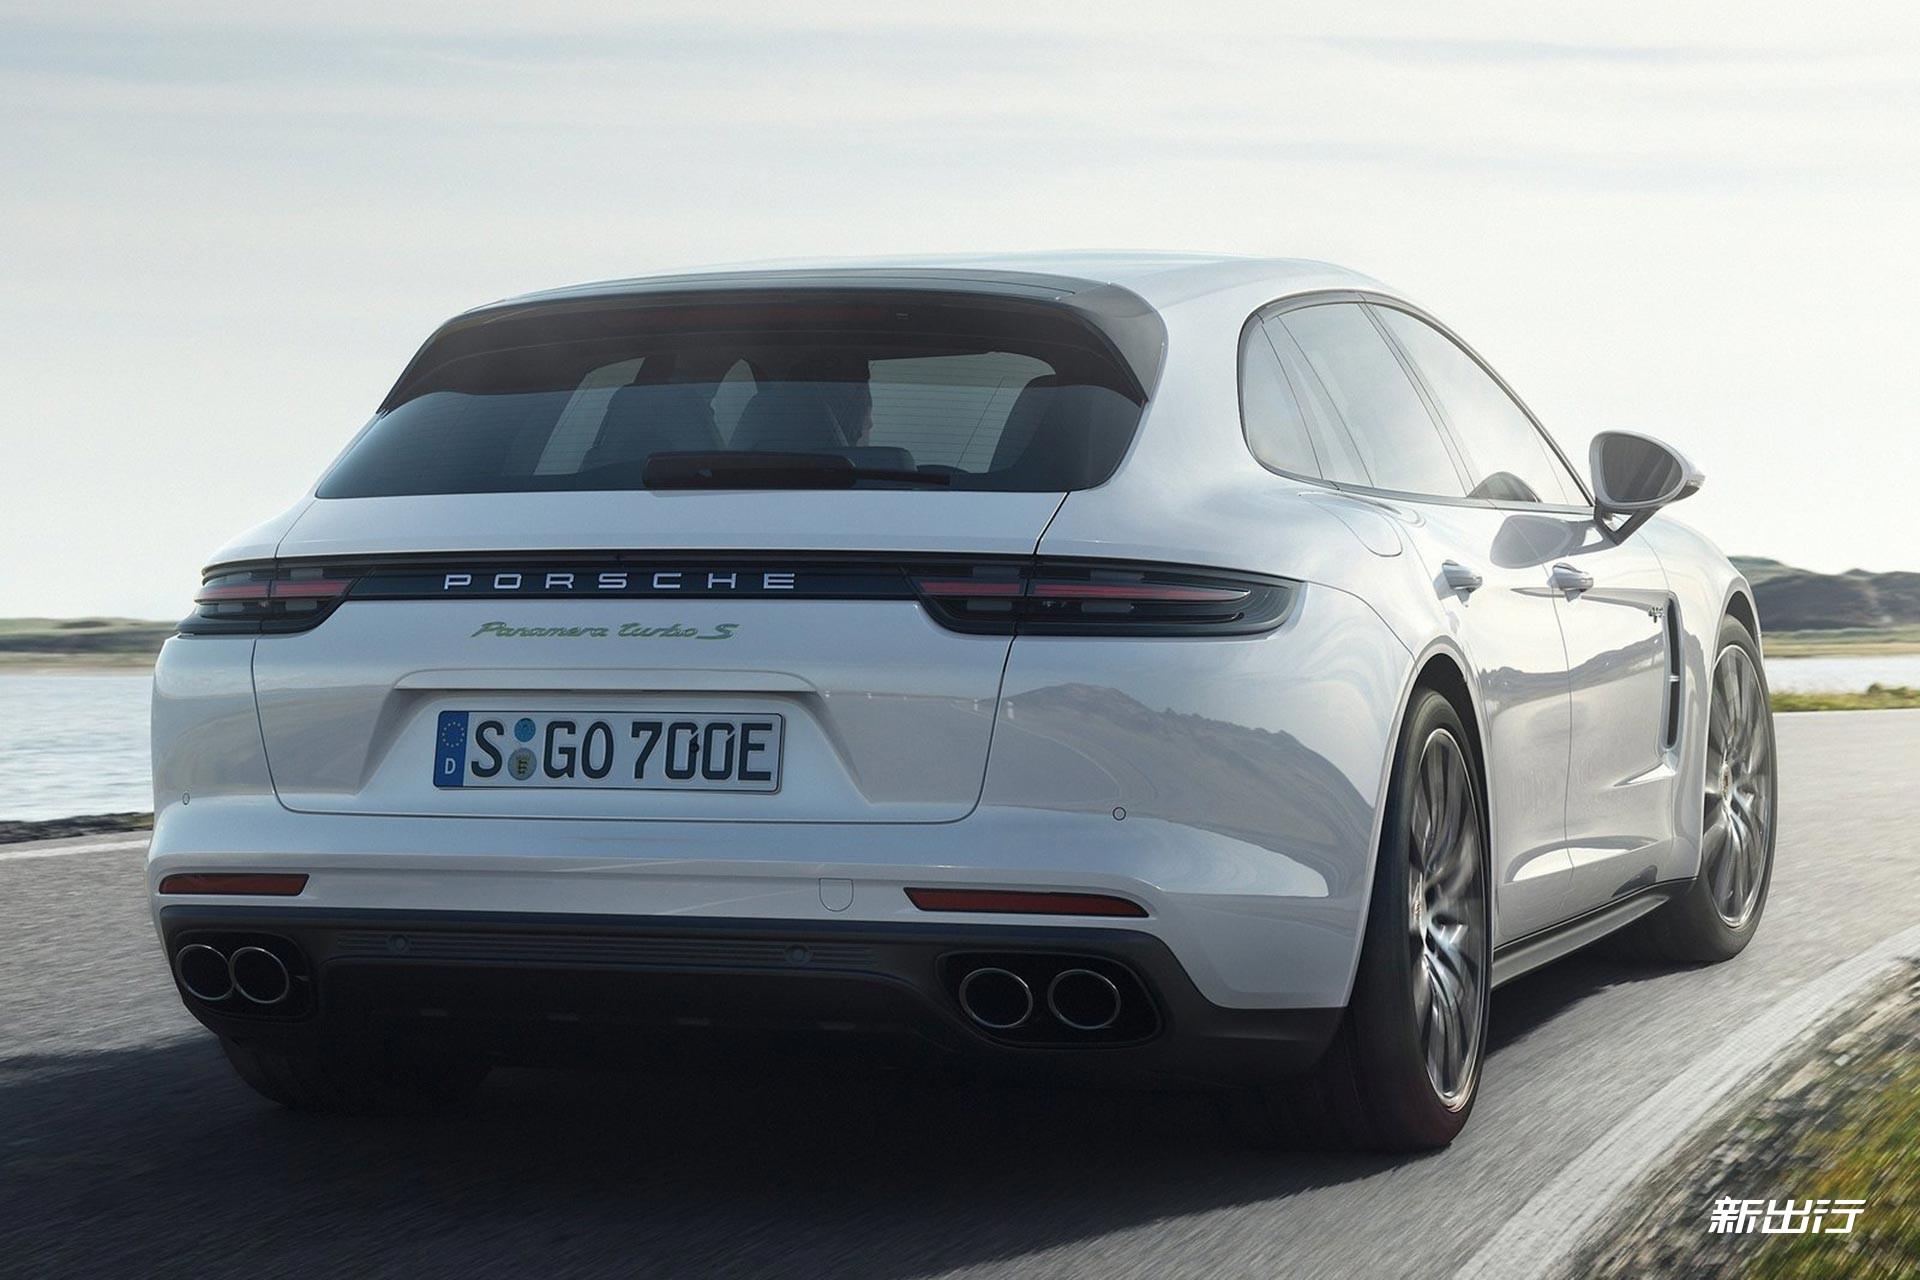 Porsche-Panamera_Turbo_S_E-Hybrid_Sport_Turismo-2018-1600-06.jpg